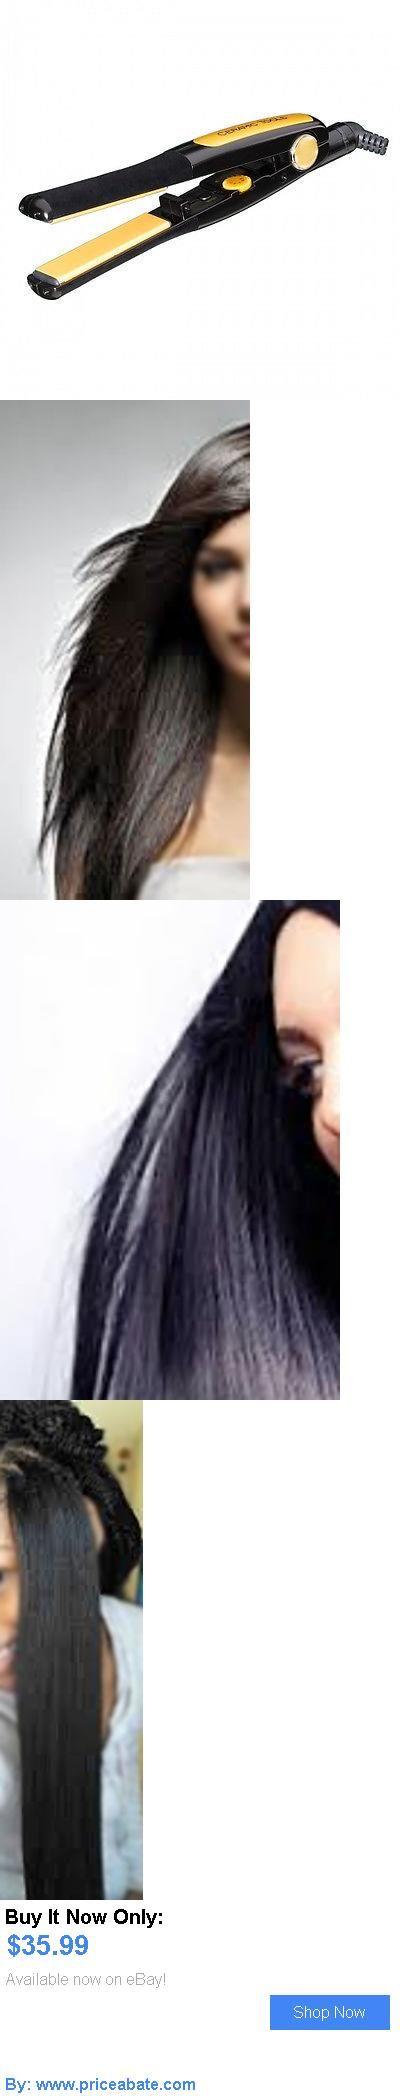 Farouk turbo inch ceramic flat iron p 46 - Hair Beauty Babyliss Professional Flat Iron 1 Ceramic Hair Straightener Best Styling Tools Buy It